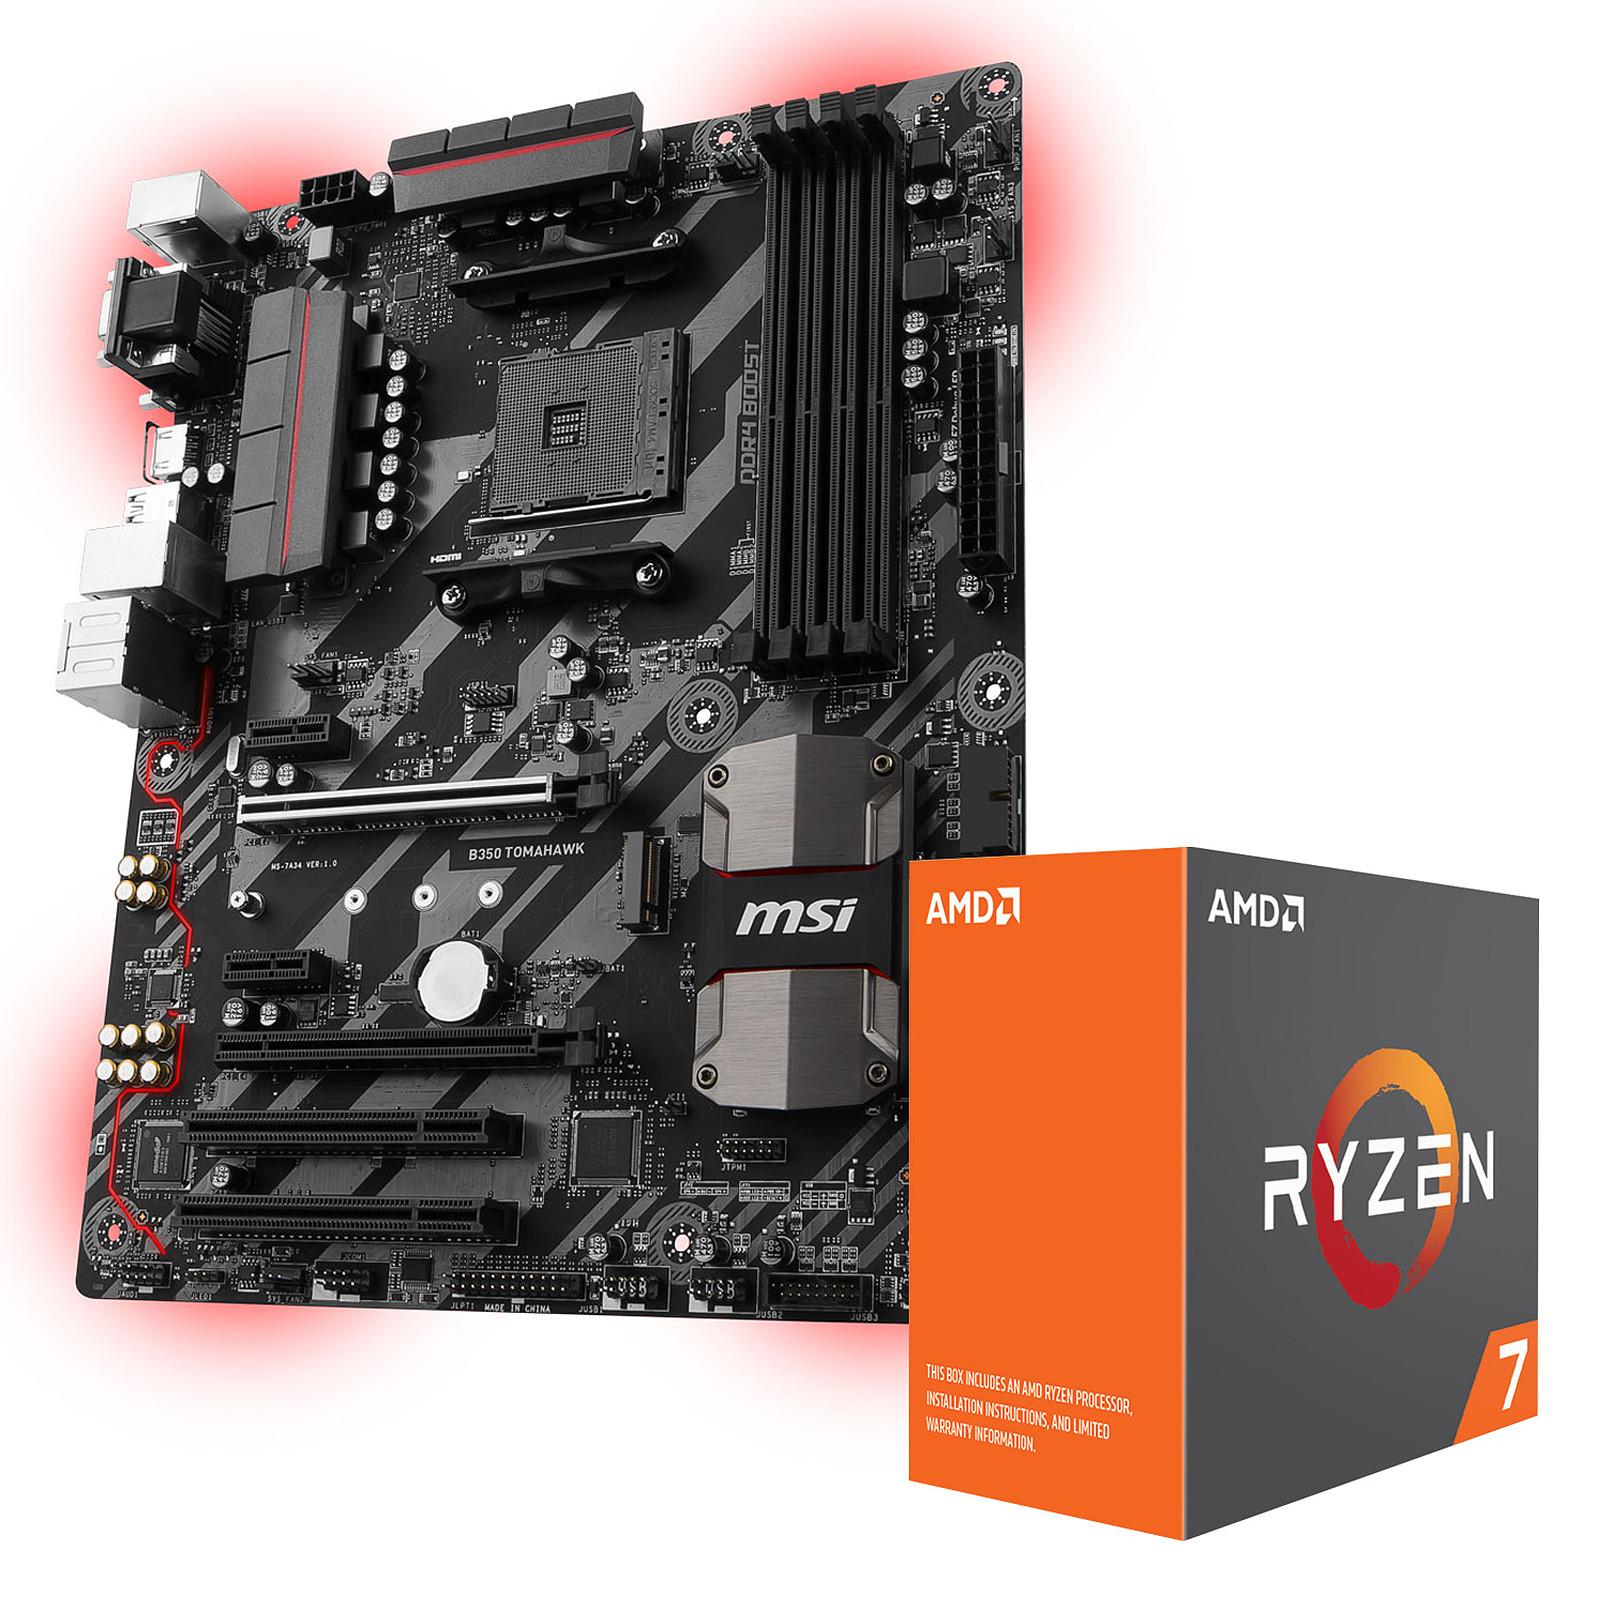 AMD Ryzen 7 1700X (3.4 GHz) + MSI B350 TOMAHAWK